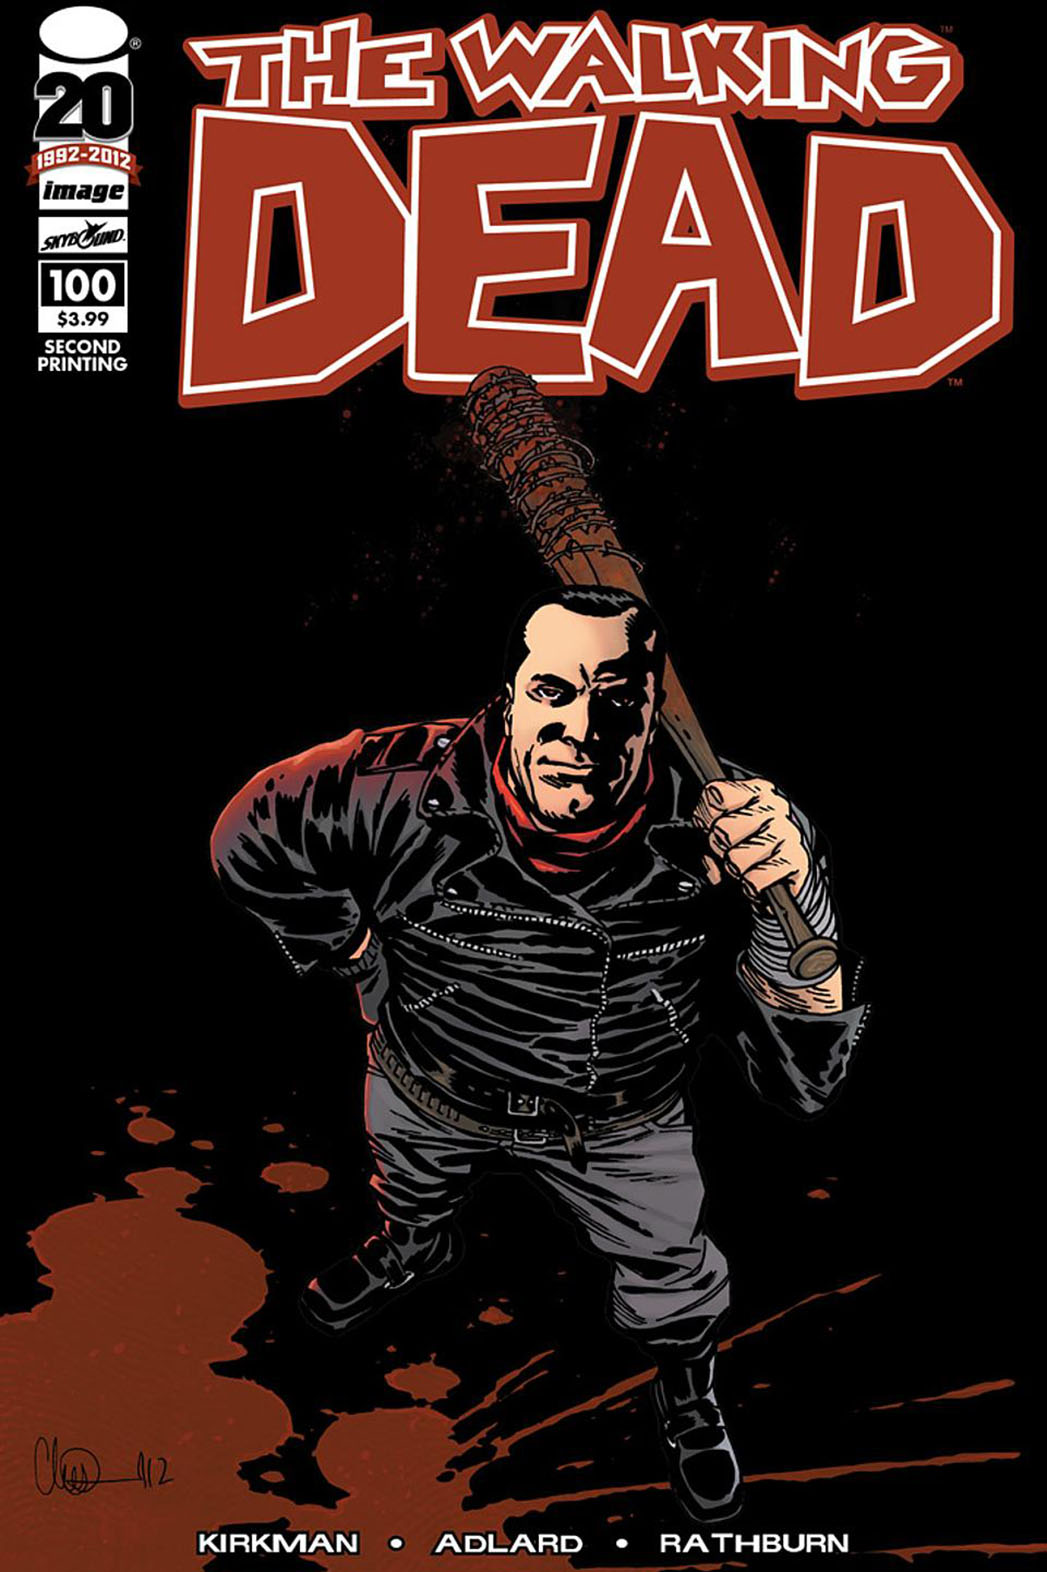 The Walking Dead Neegan Cover - P 2015